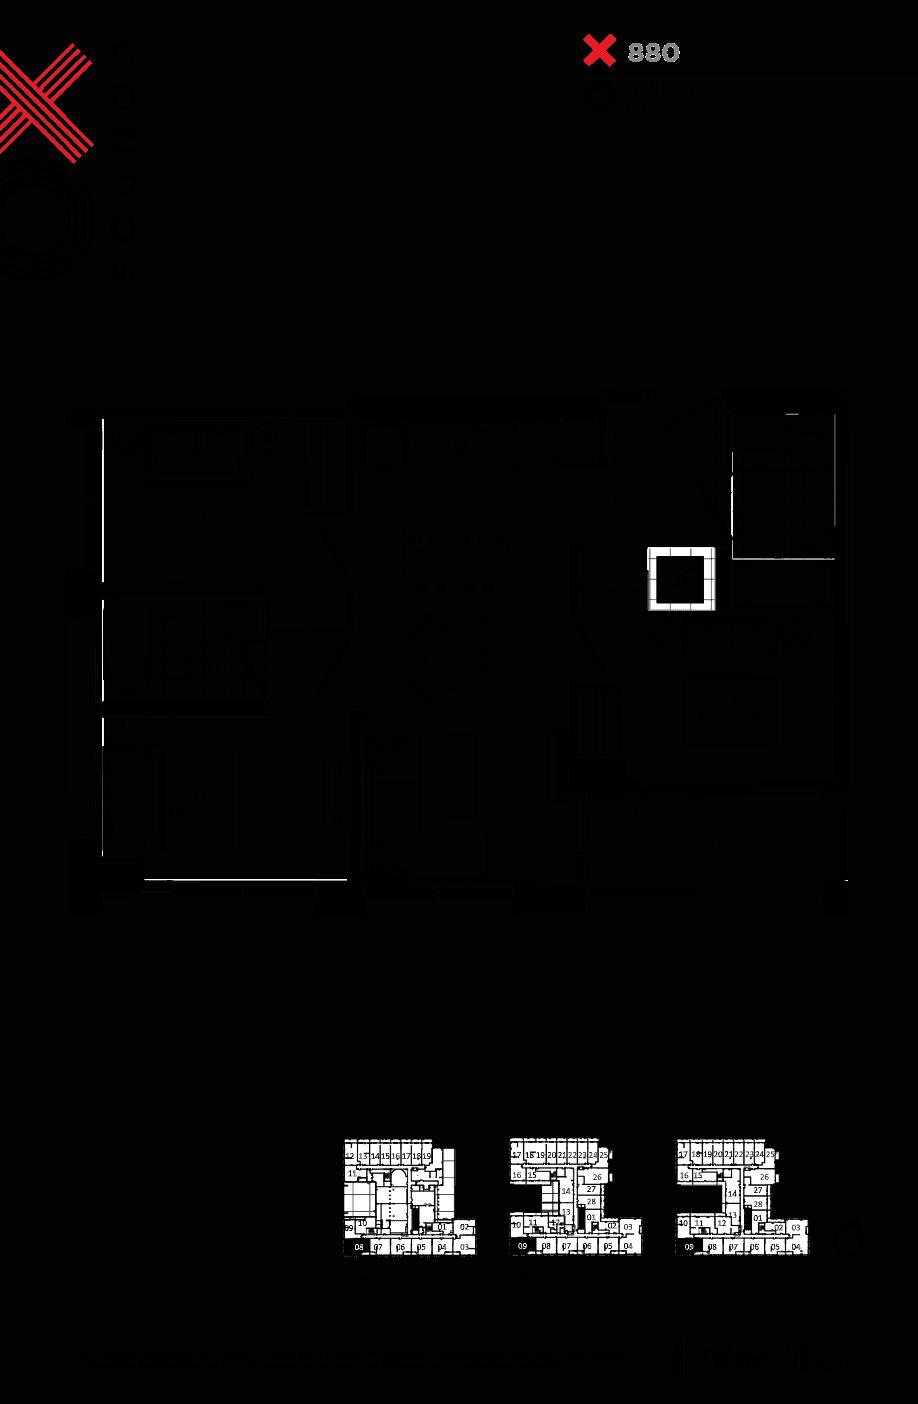 2019 04 09 03 13 39 xo condos floor plans part14 1